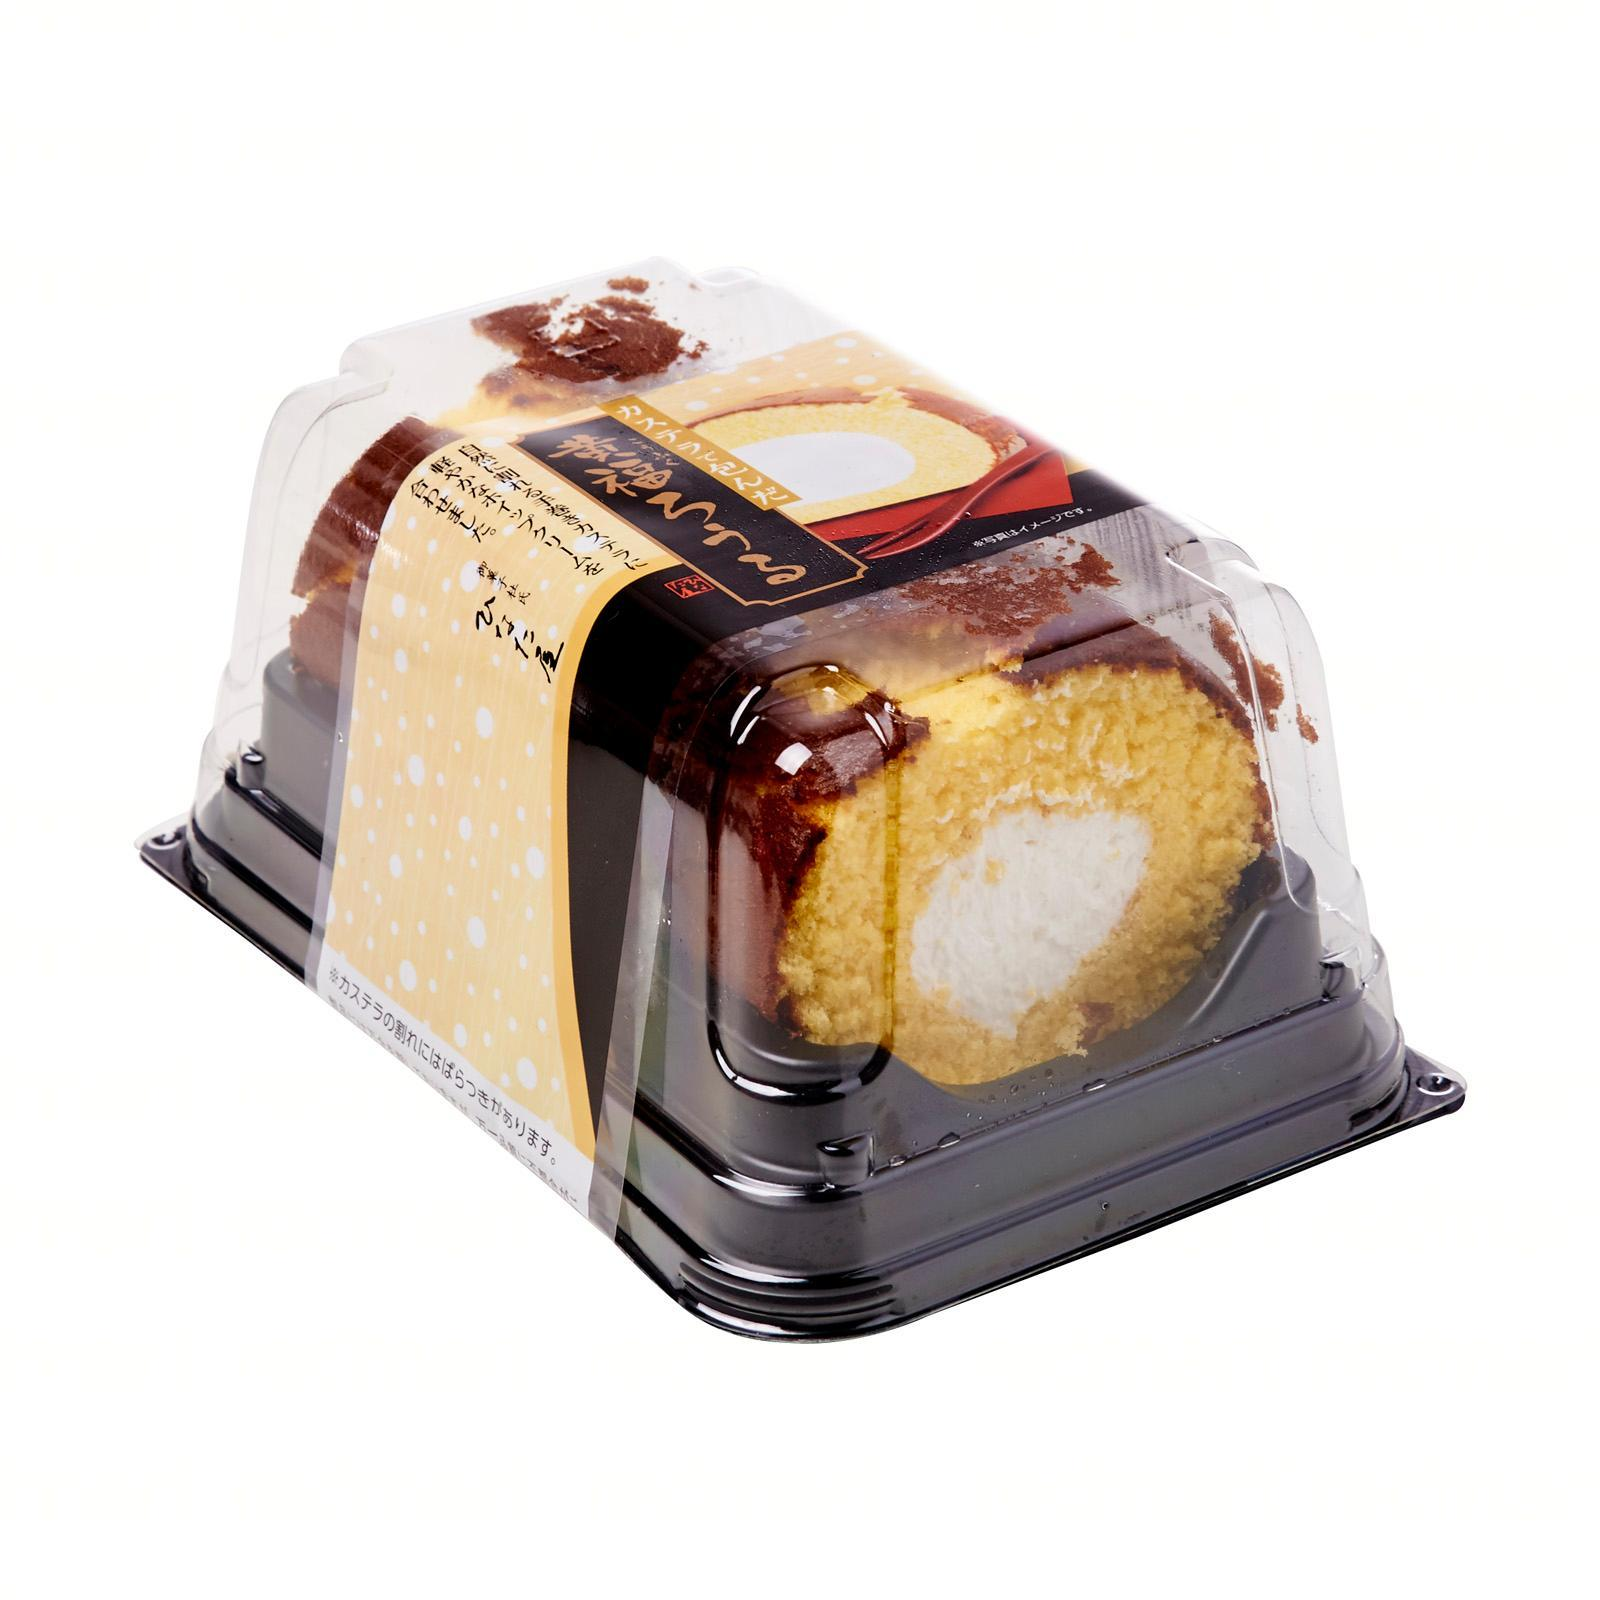 Sunlavieen Kofuku Castella Roll Cake - Frozen - Jetro Special